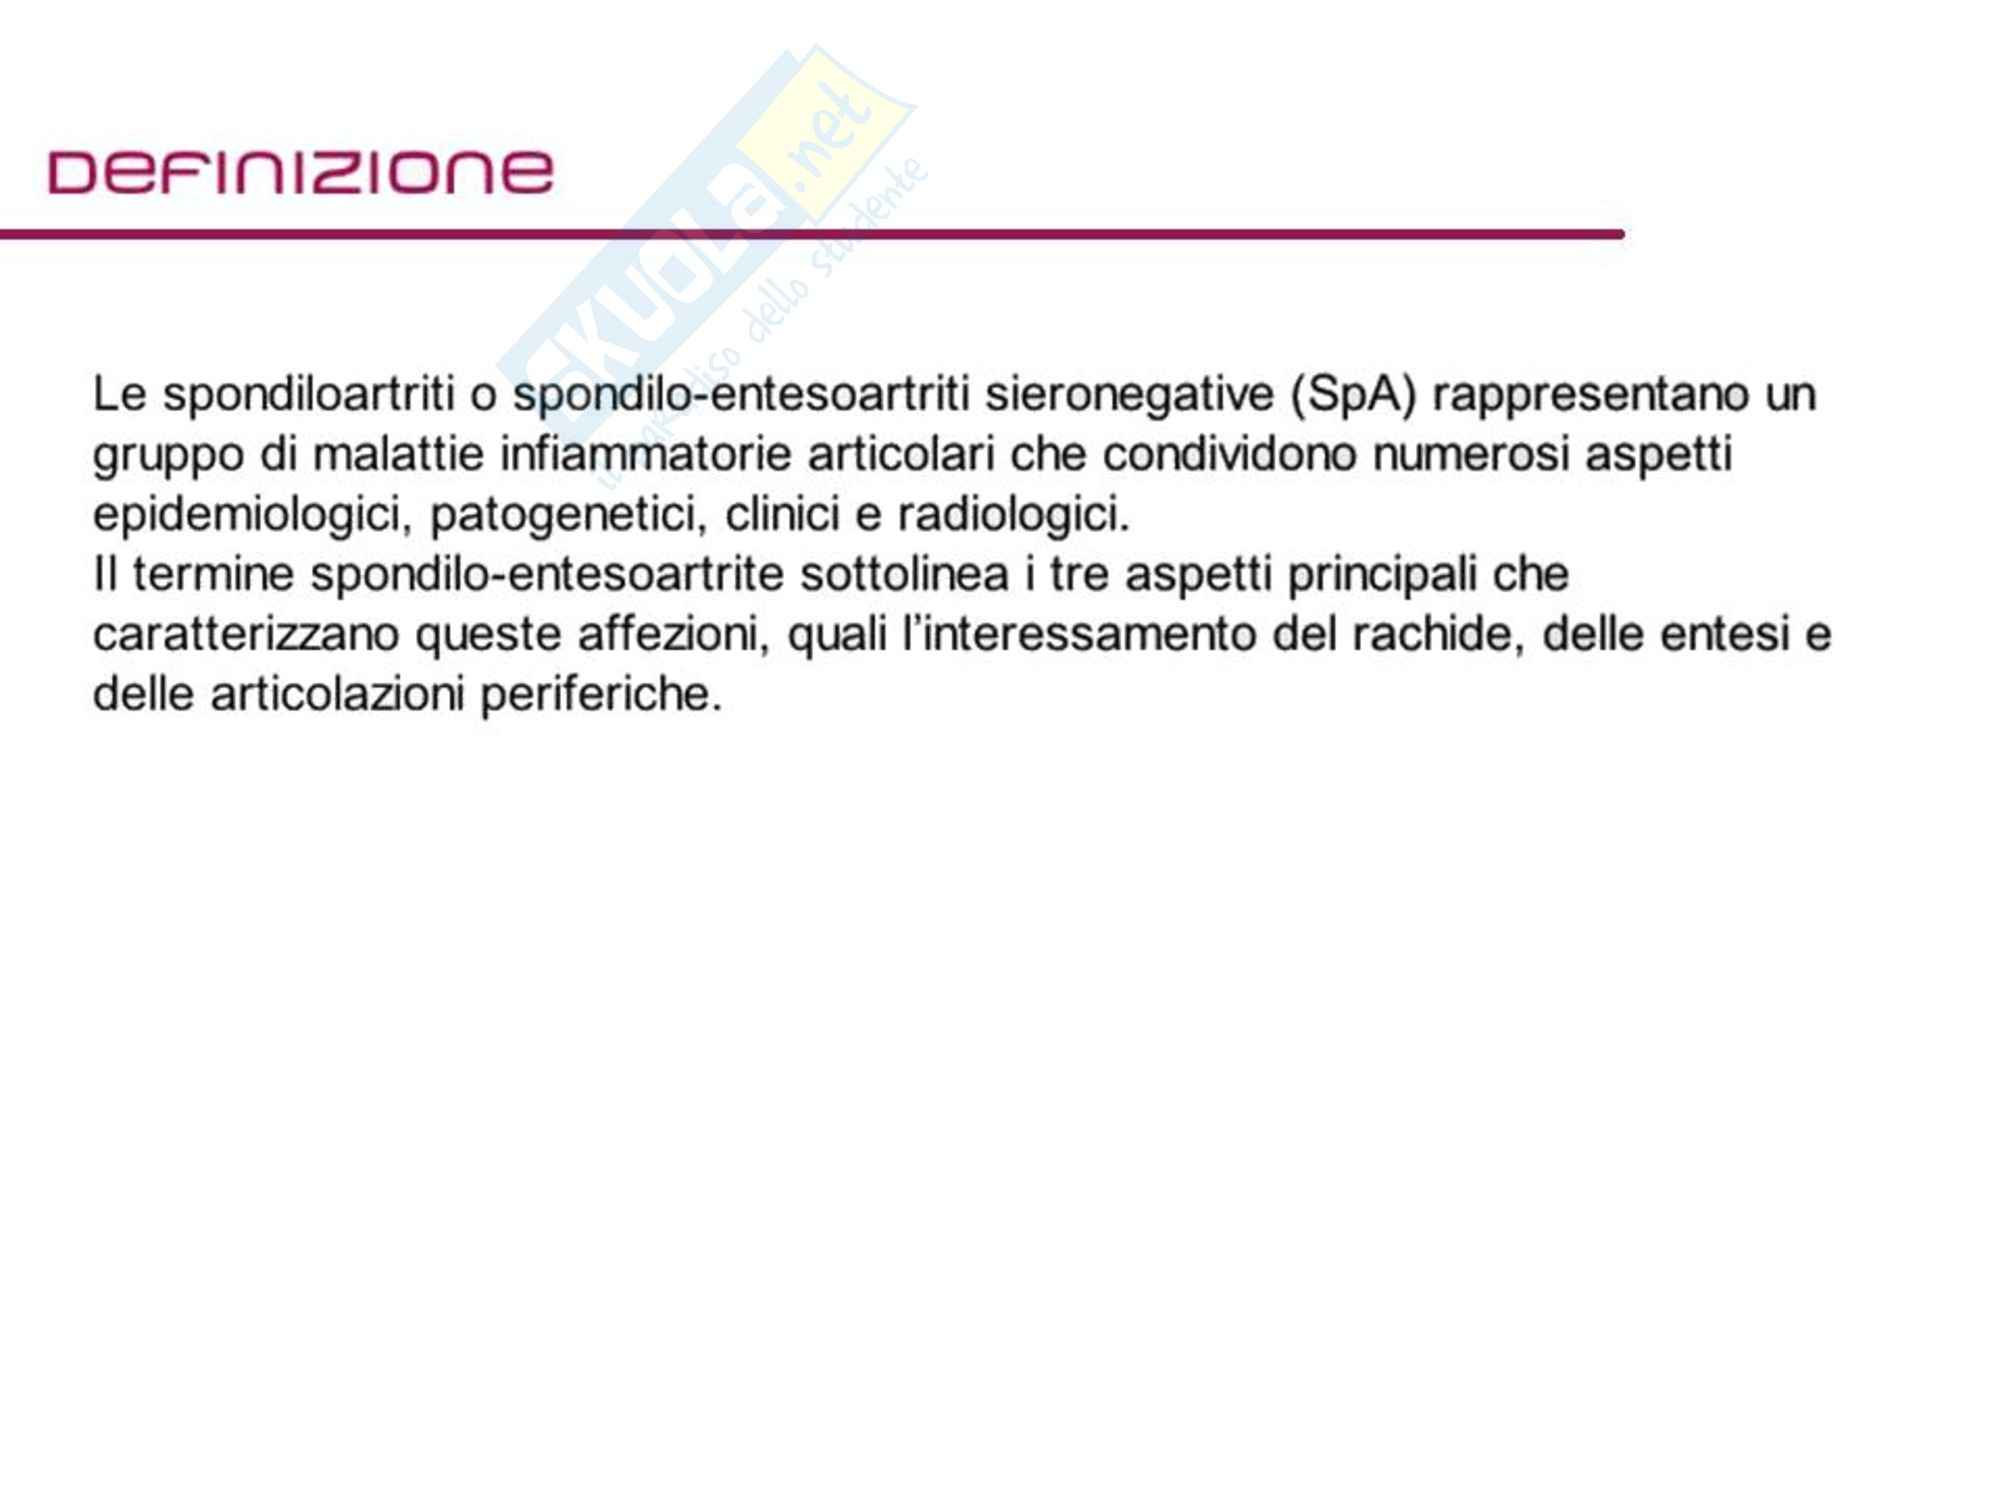 Reumatologia - Spondilo entesoartriti sieronegative